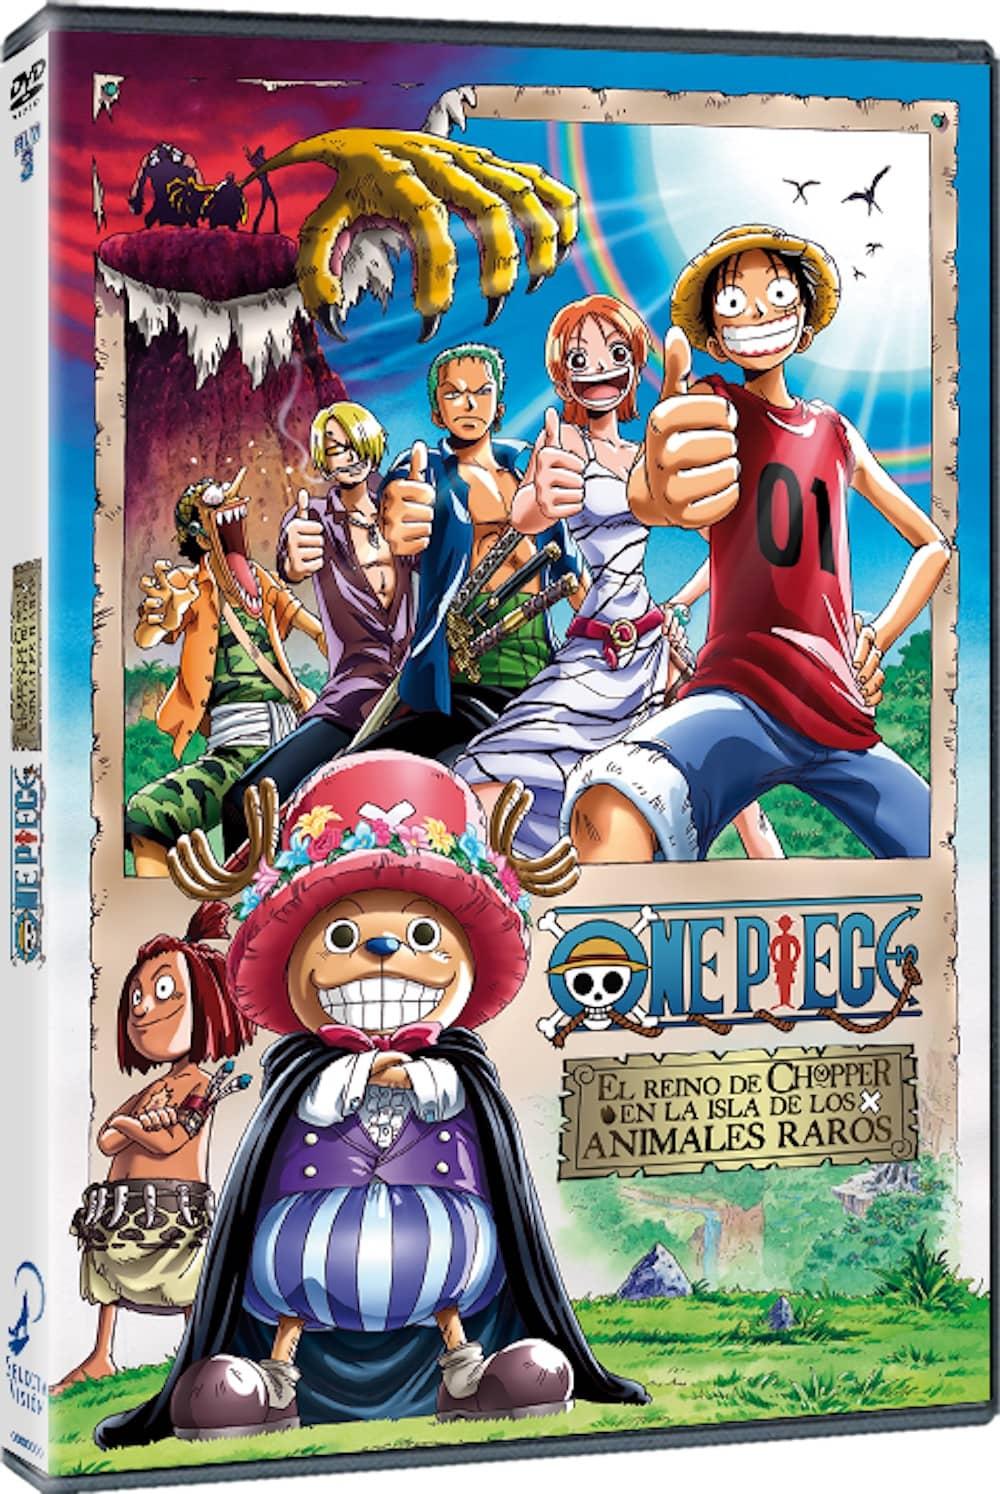 ONE PIECE FILM 3. DVD